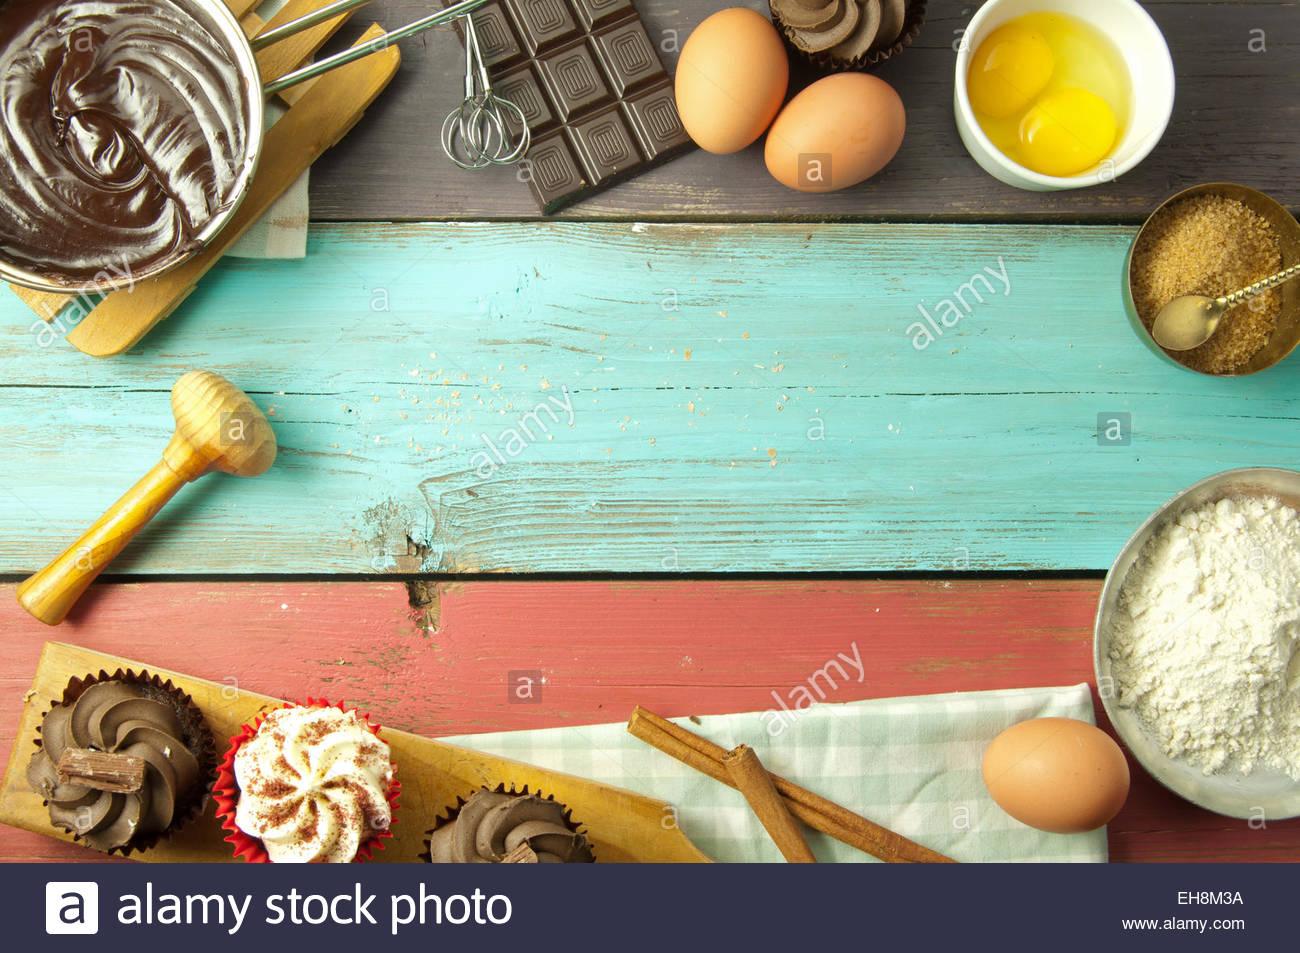 Baking a new recipe background Stock Photo 79482014   Alamy 1300x953